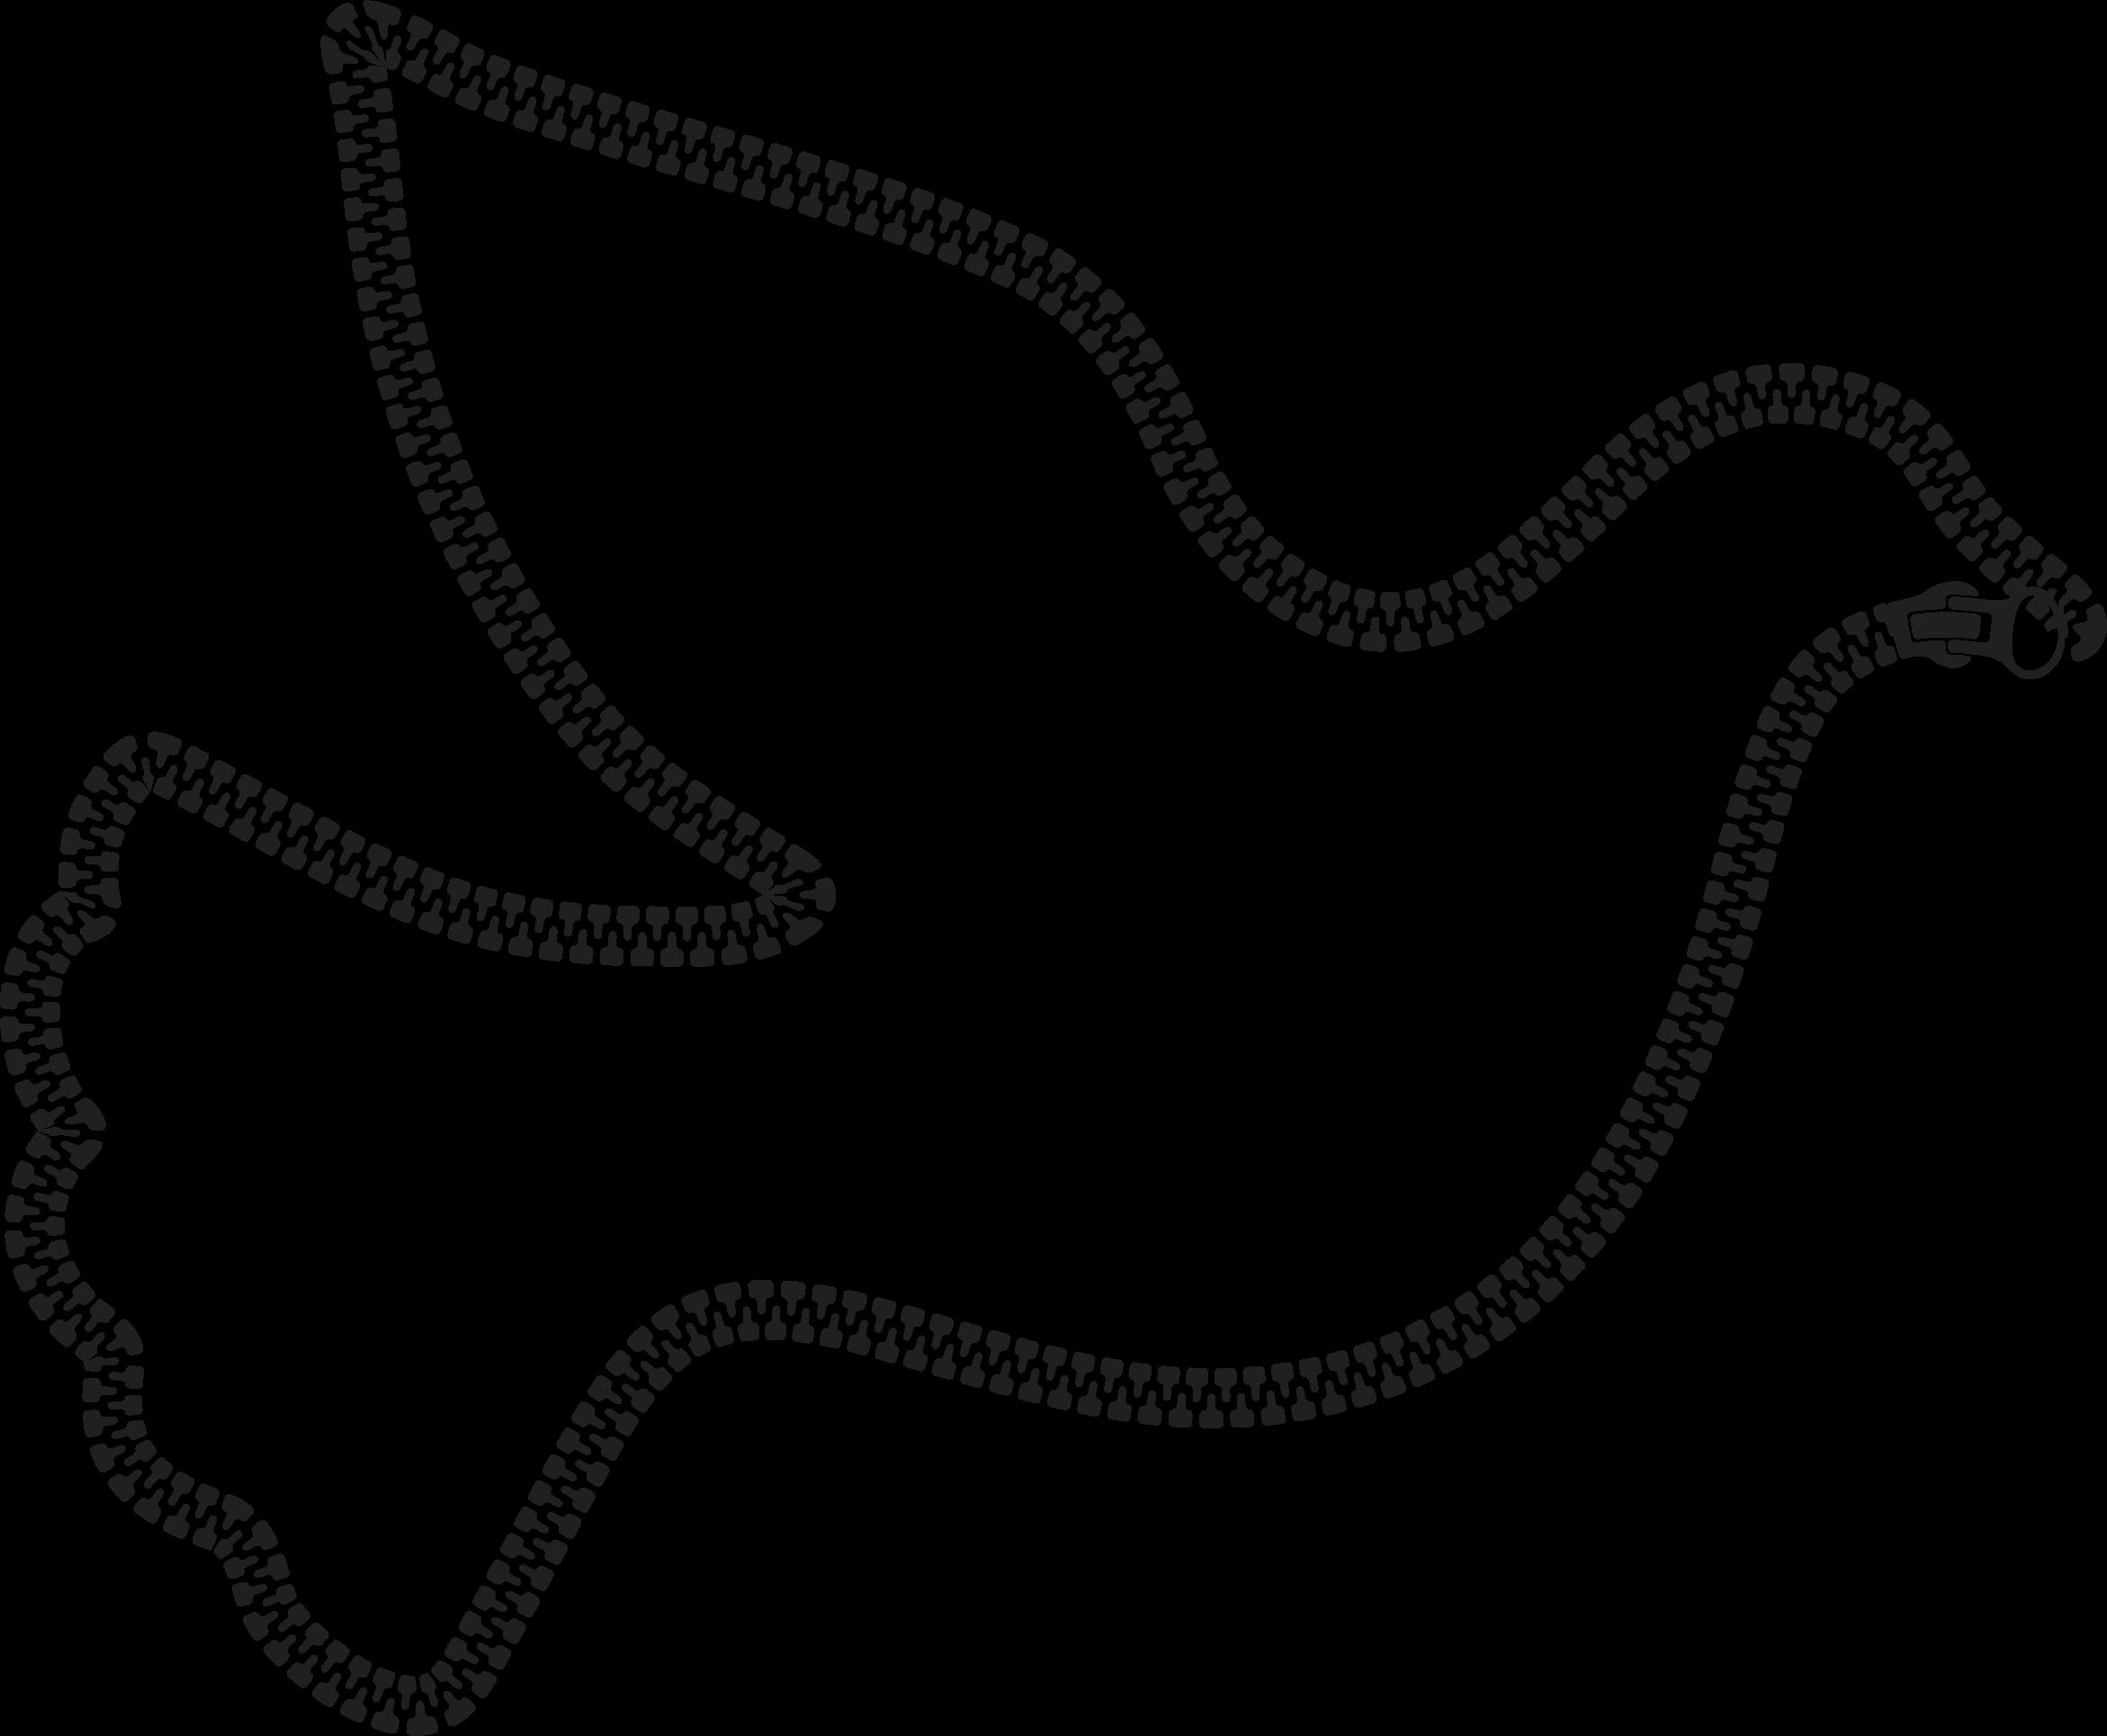 Peace clipartblack com animal. Dove clipart black and white